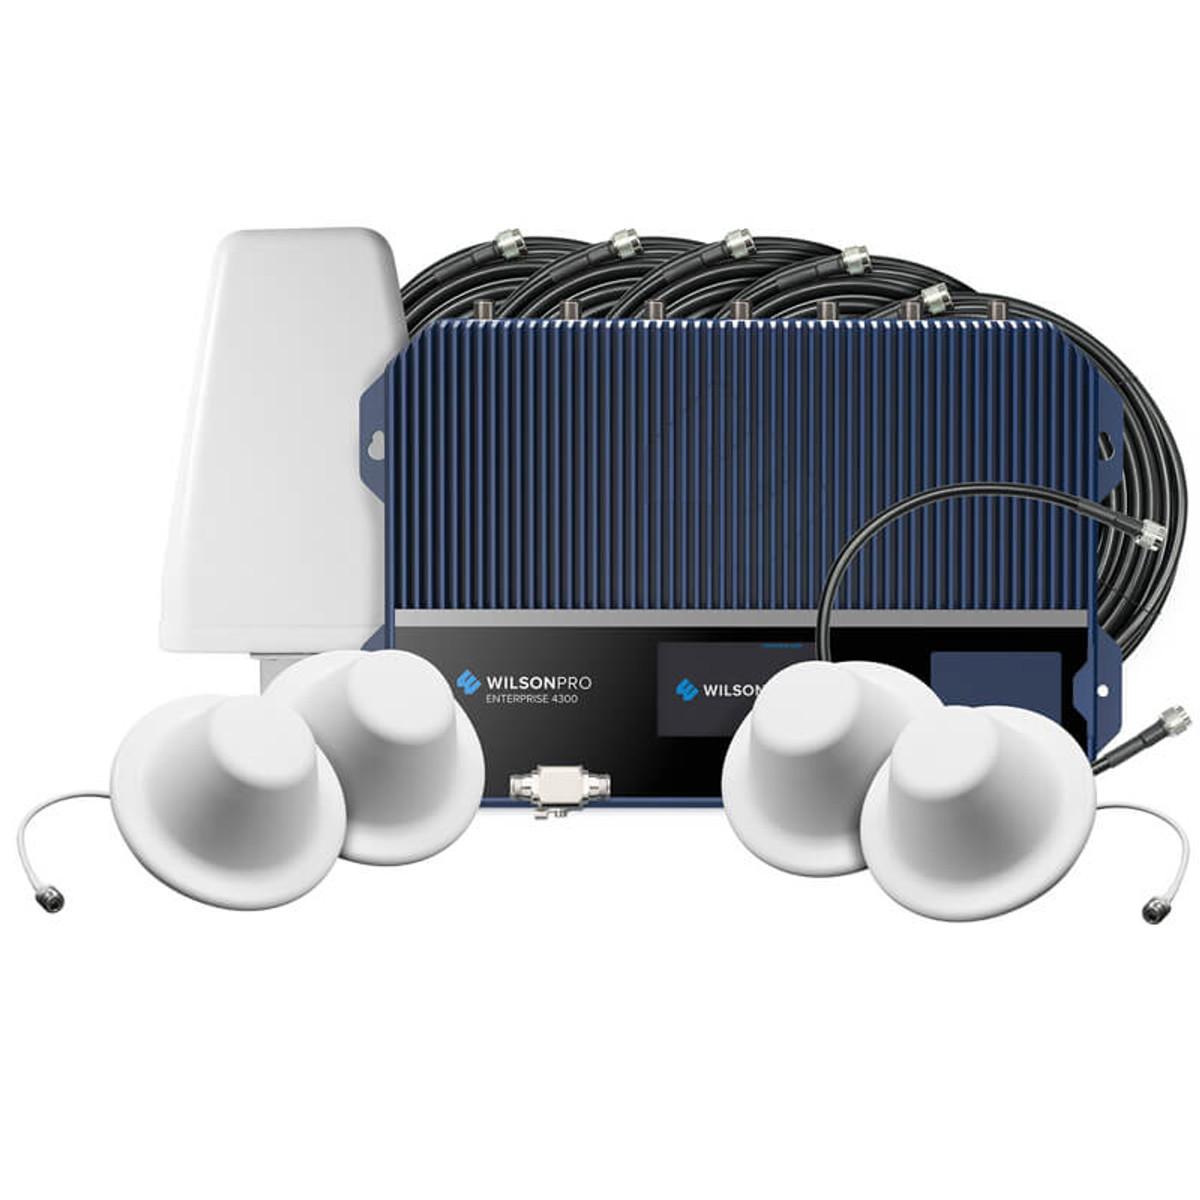 WilsonPro Enterprise 4300 Commercial Signal Booster Kit | 460152F